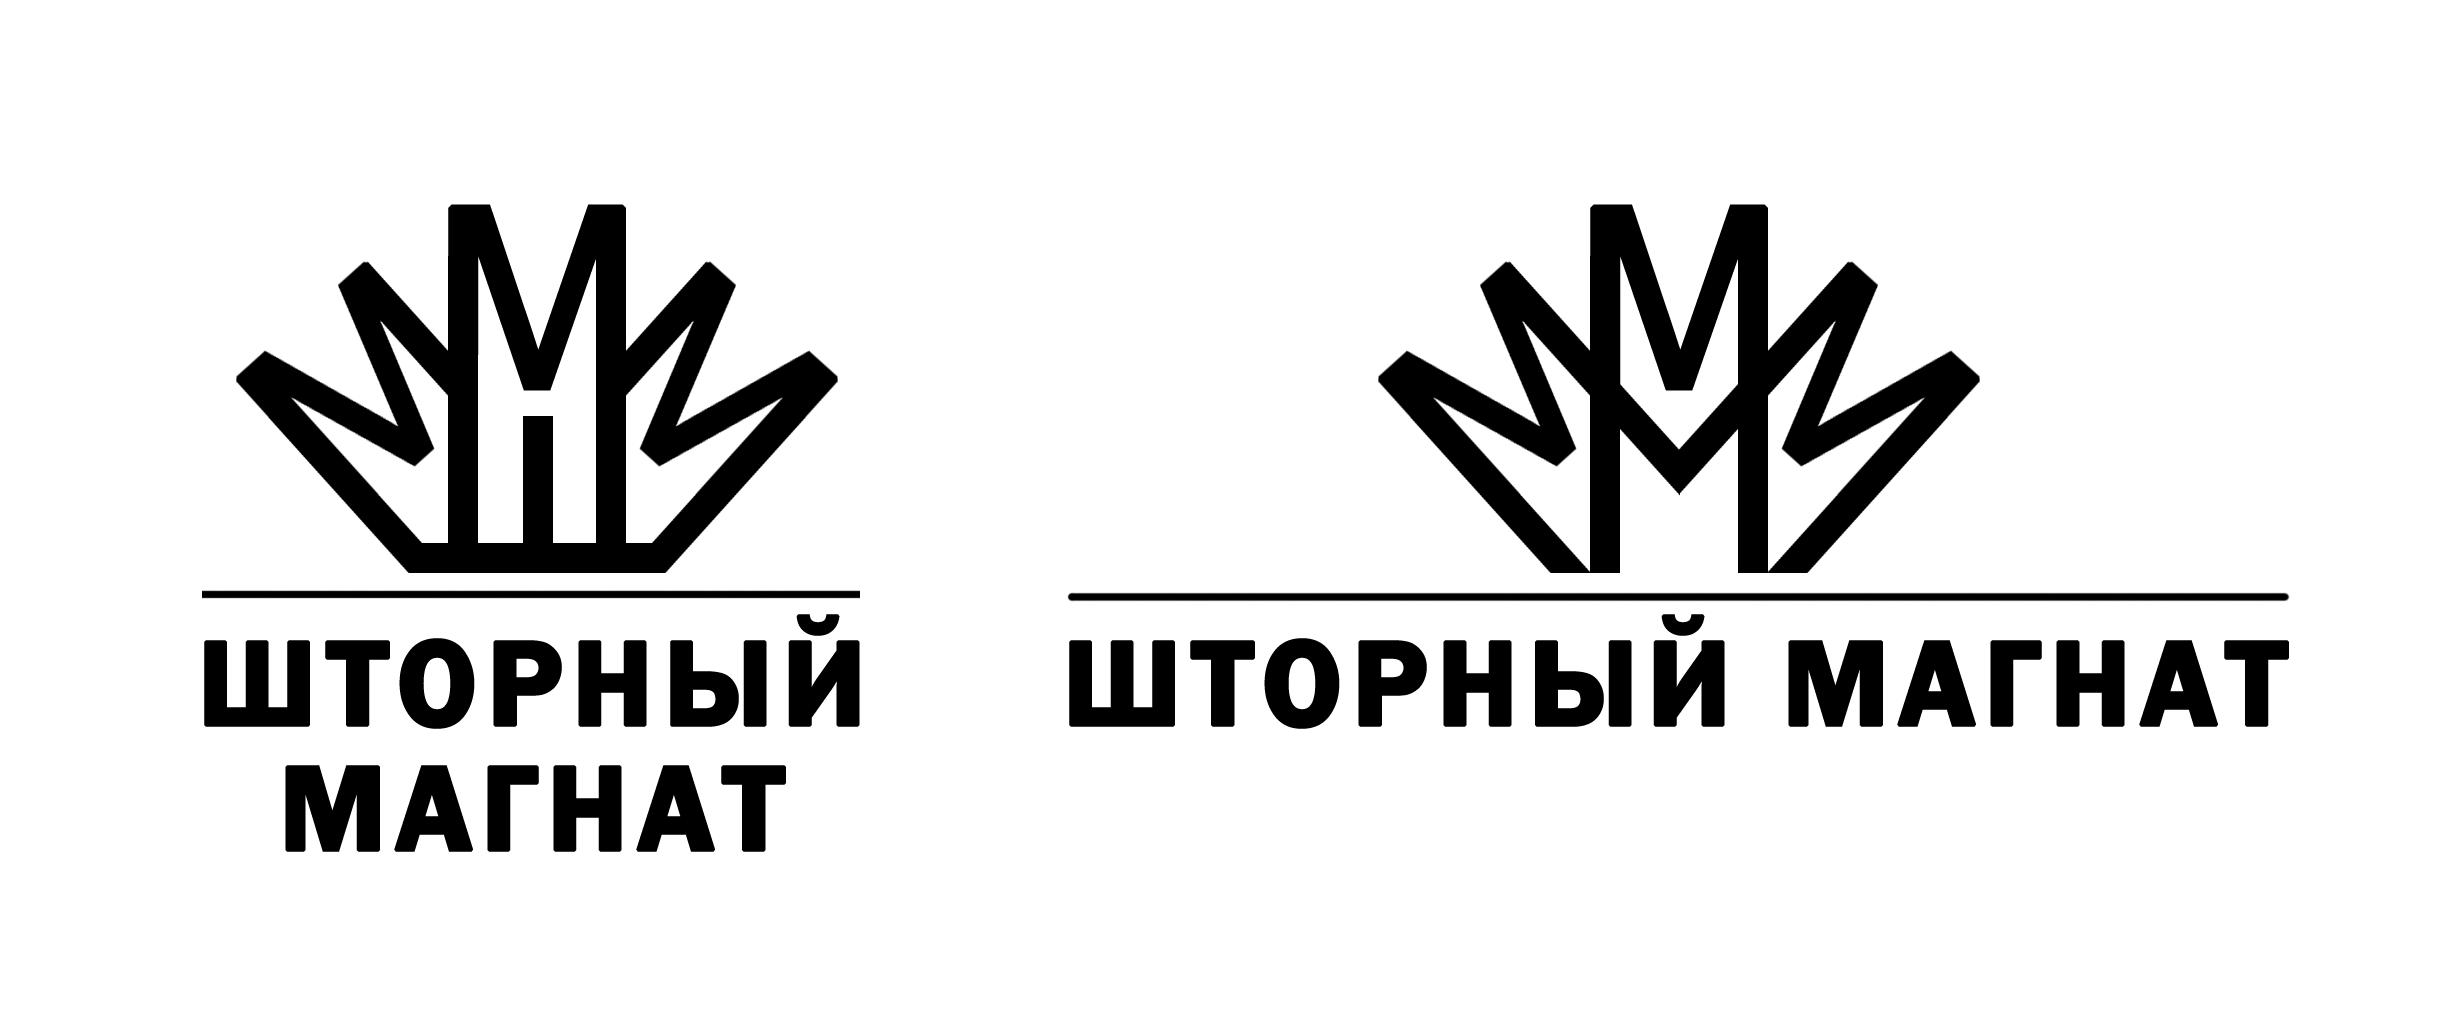 Логотип и фирменный стиль для магазина тканей. фото f_3255cdbe8d4b535f.png